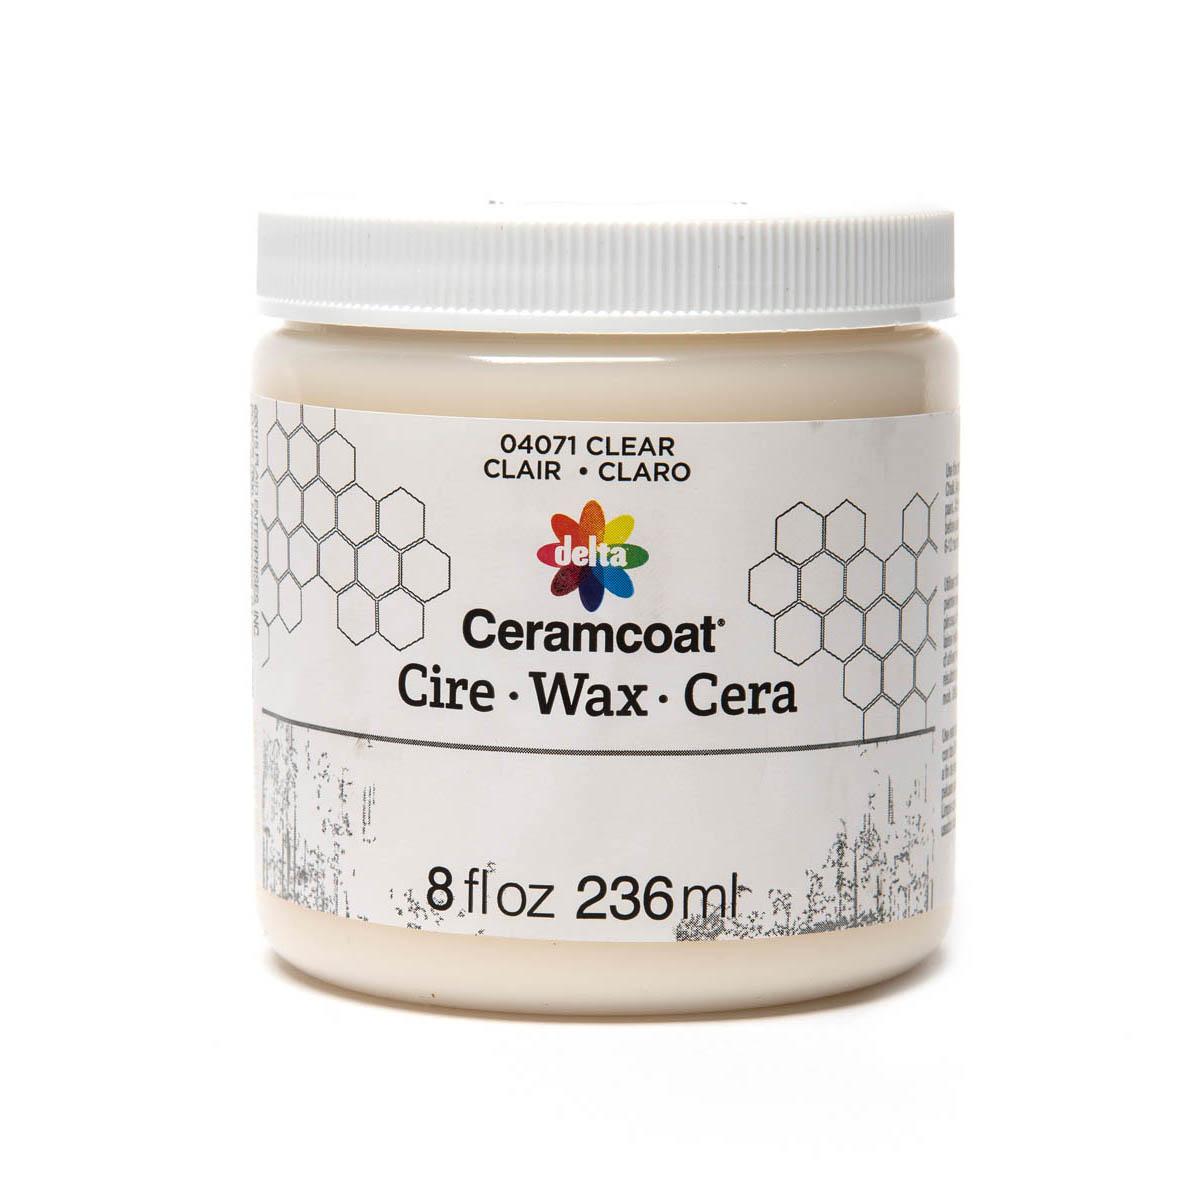 Delta Ceramcoat ® Wax - Clear, 8 oz. - 04071